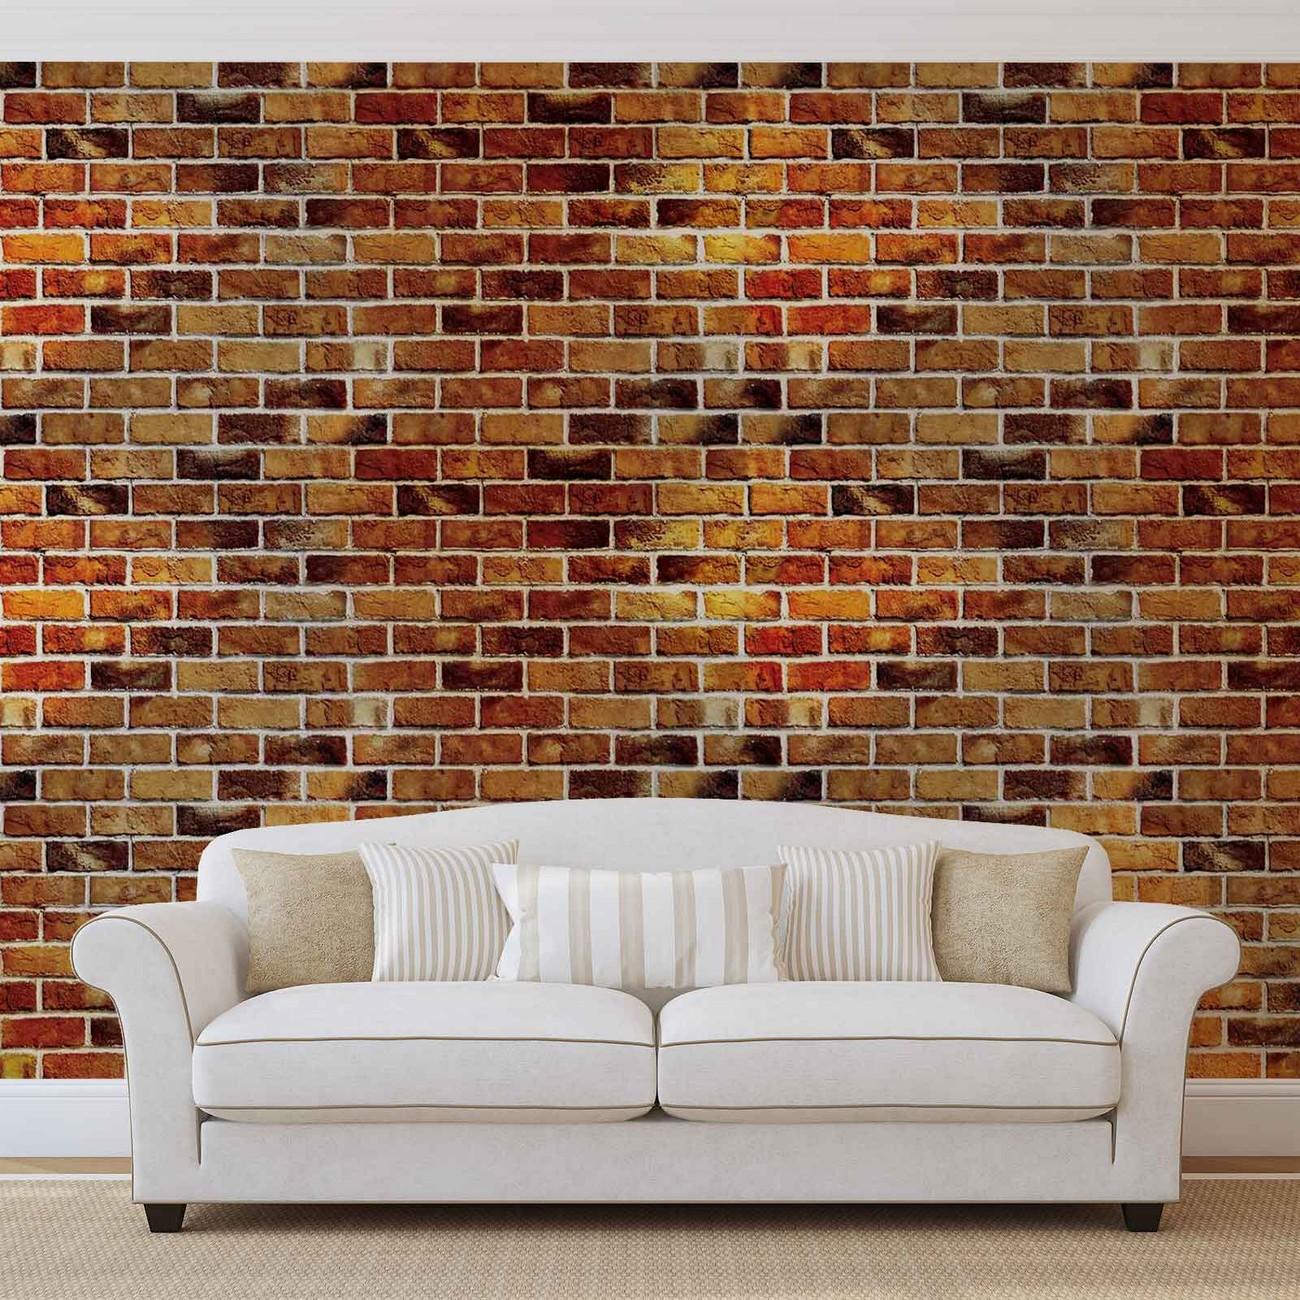 Carta da parati muro di mattoni for Carta da parati 3d mattoni